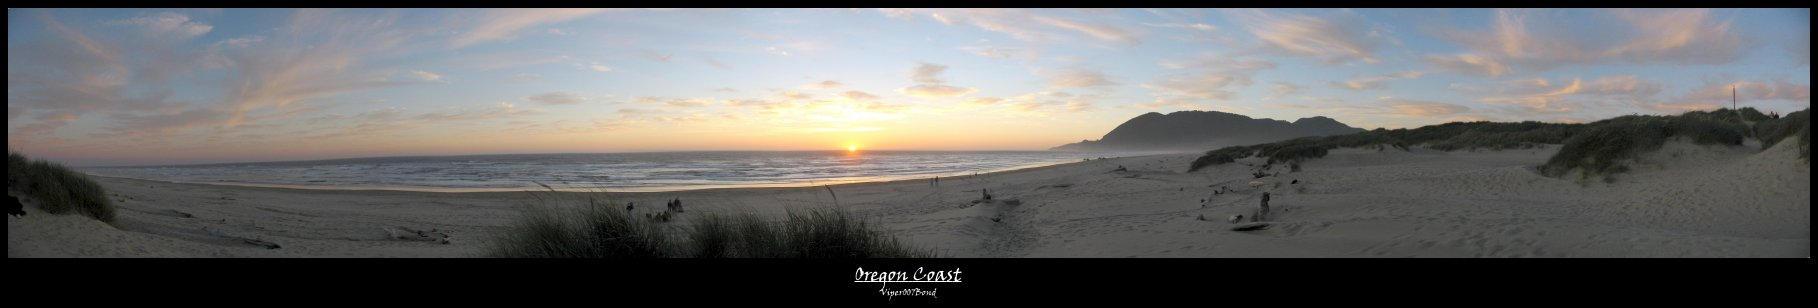 Oregon Coast by viper007bond